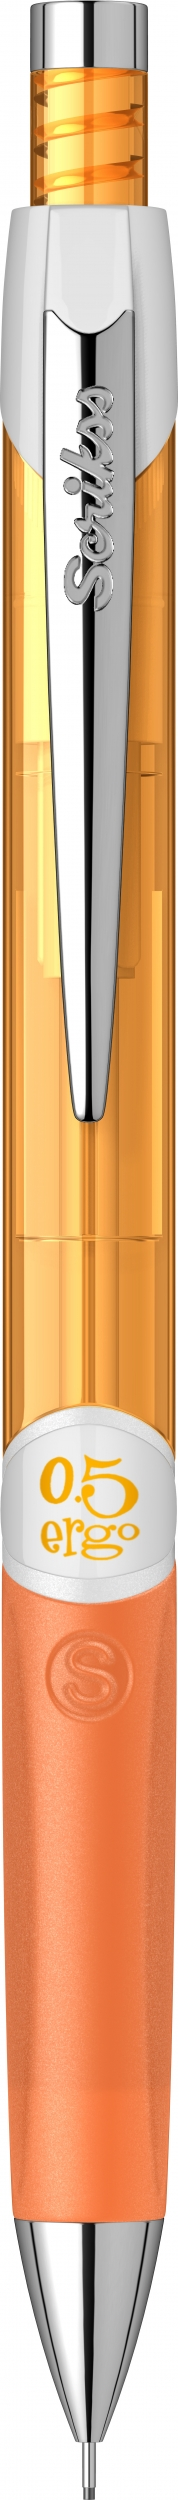 Механичен молив Ergo Scrikss 0,5мм., модел 72155, , Неон Оранжев